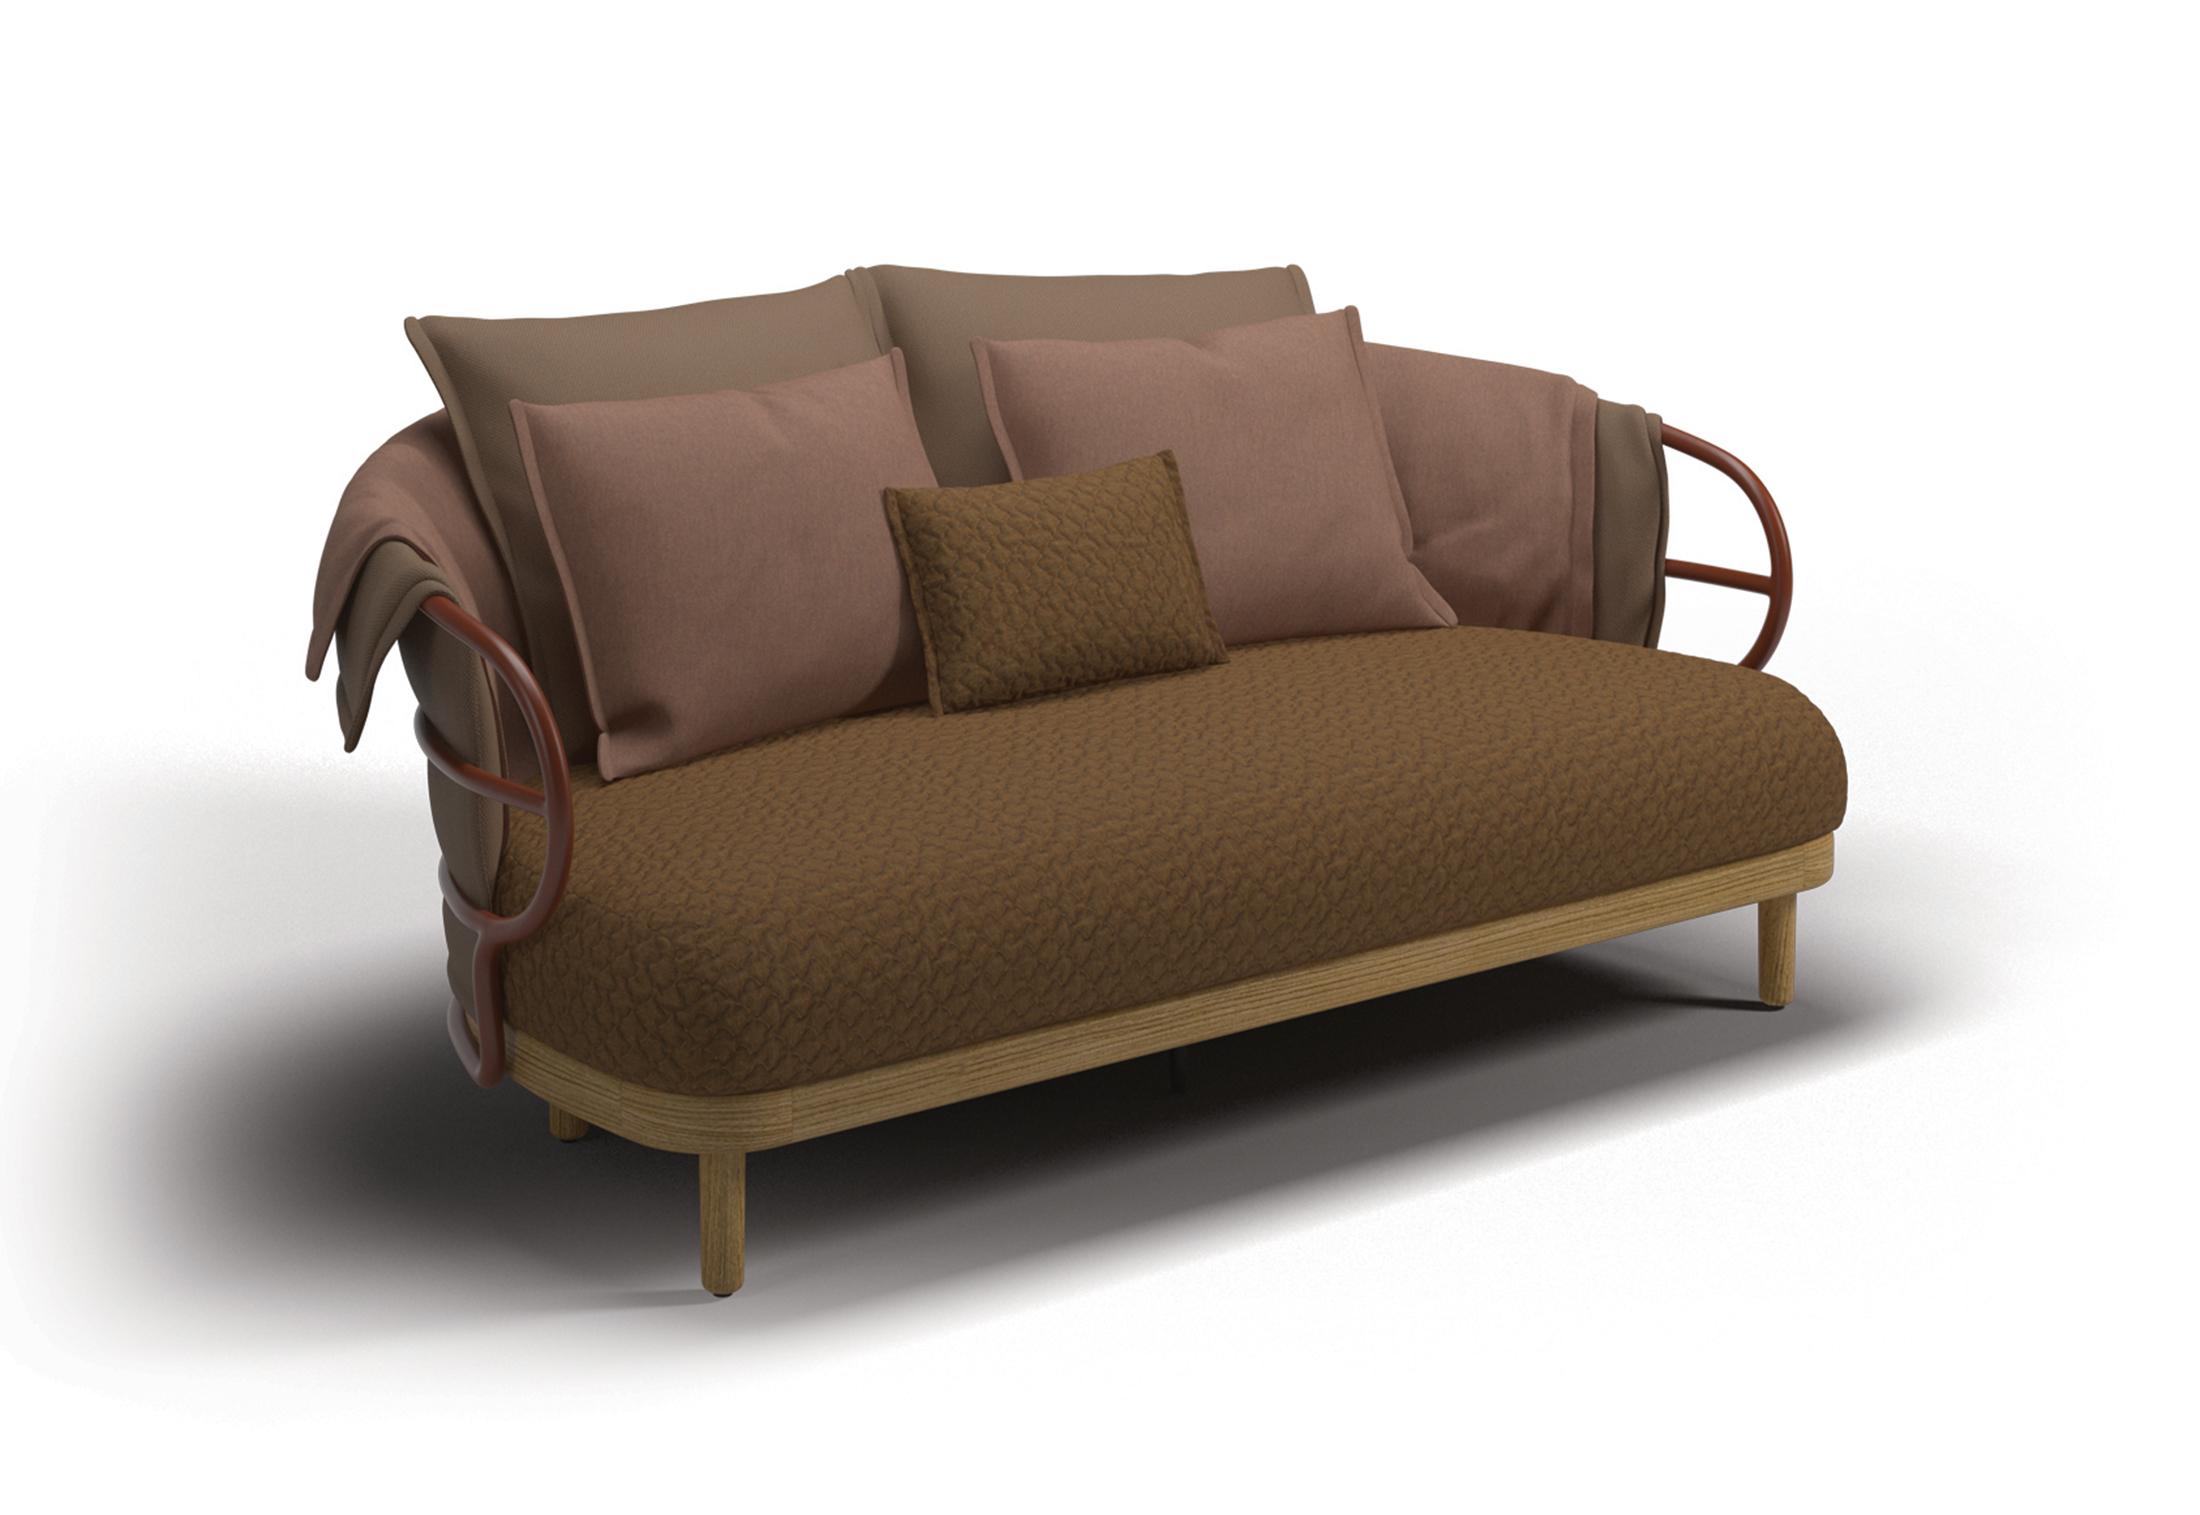 dune outdoor furniture. Dune Sofa Outdoor Furniture